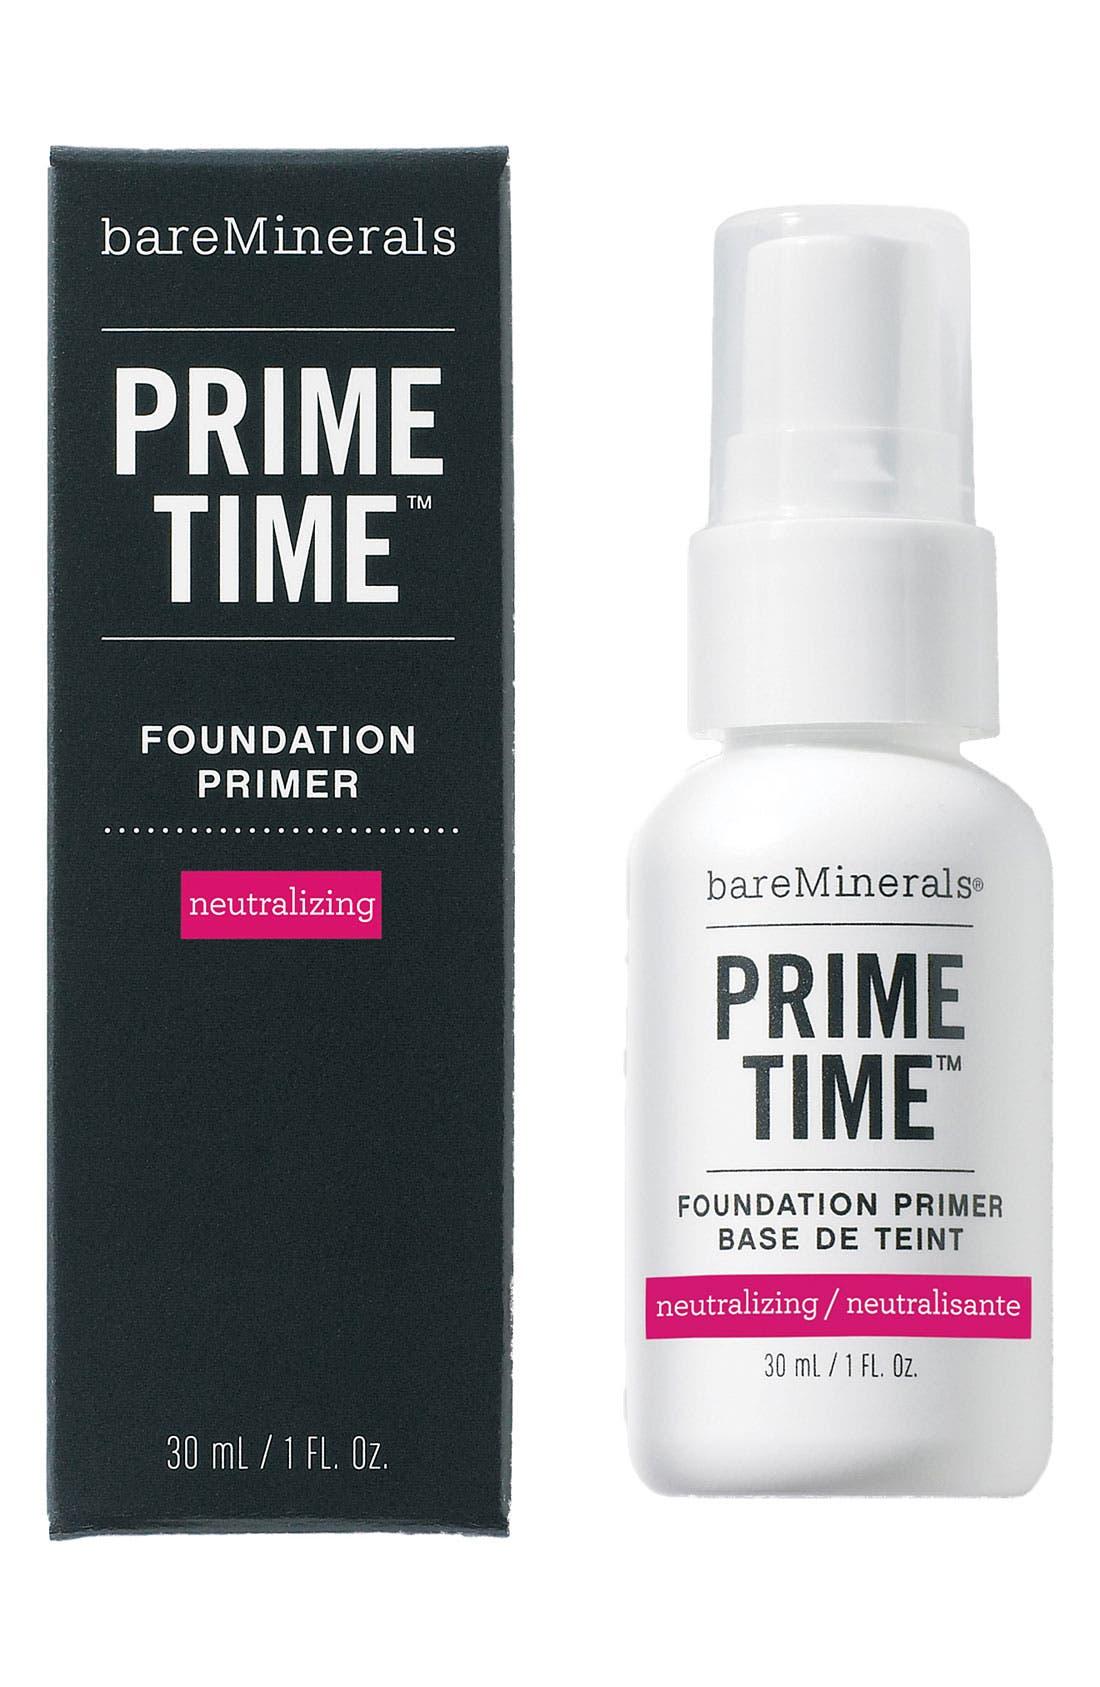 bareminerals prime time